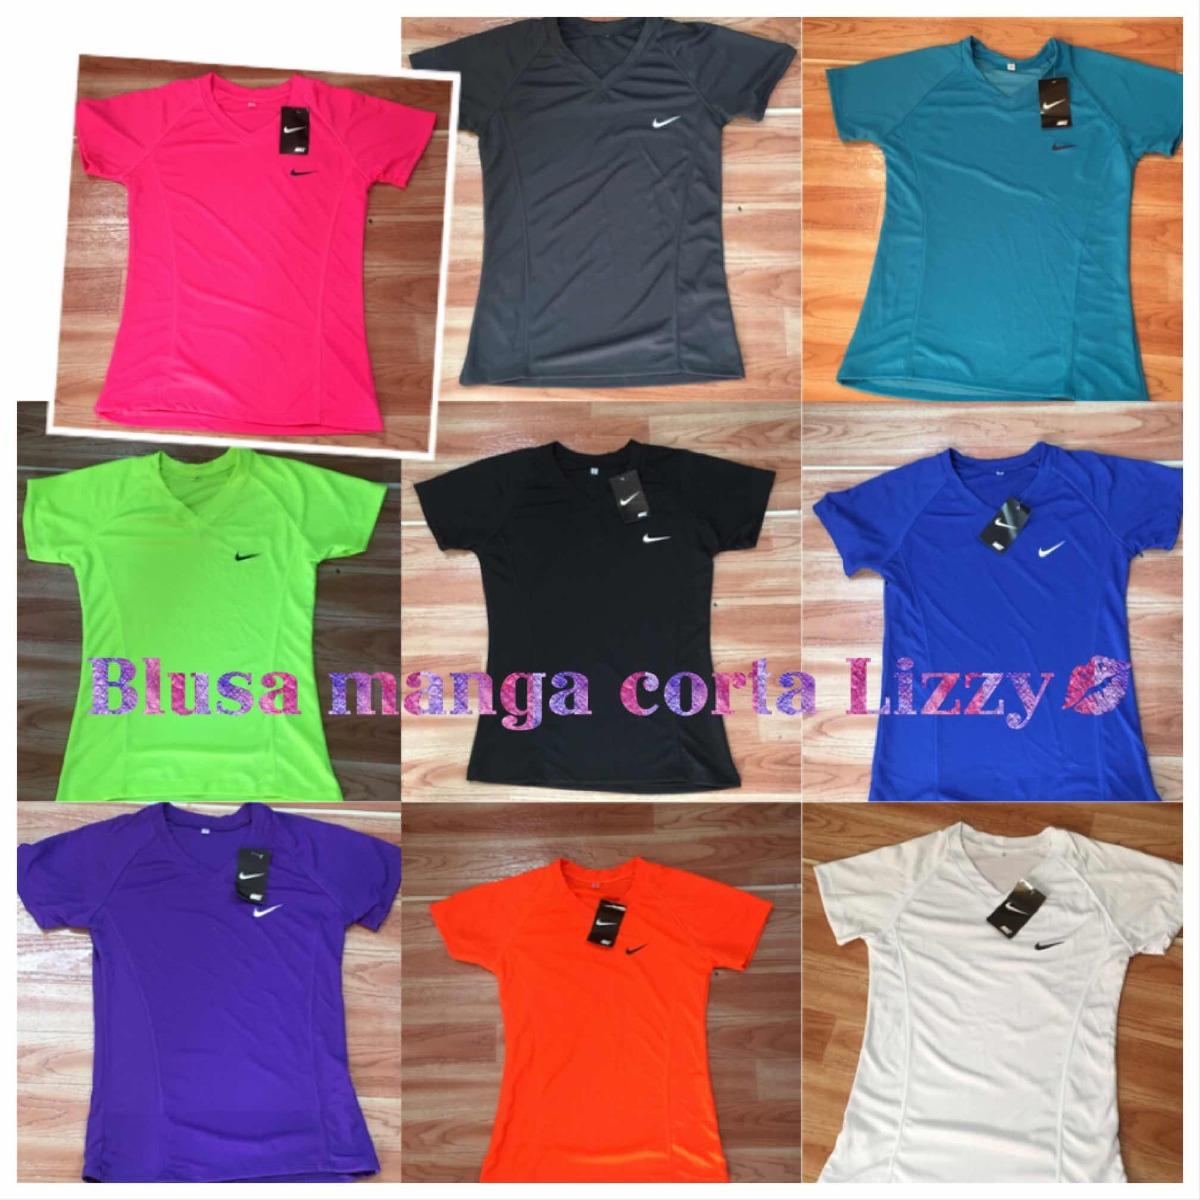 Hermosas Blusas Dry Fit Para Hacer Ejercicio -   180.00 en Mercado Libre e98687e91e55c